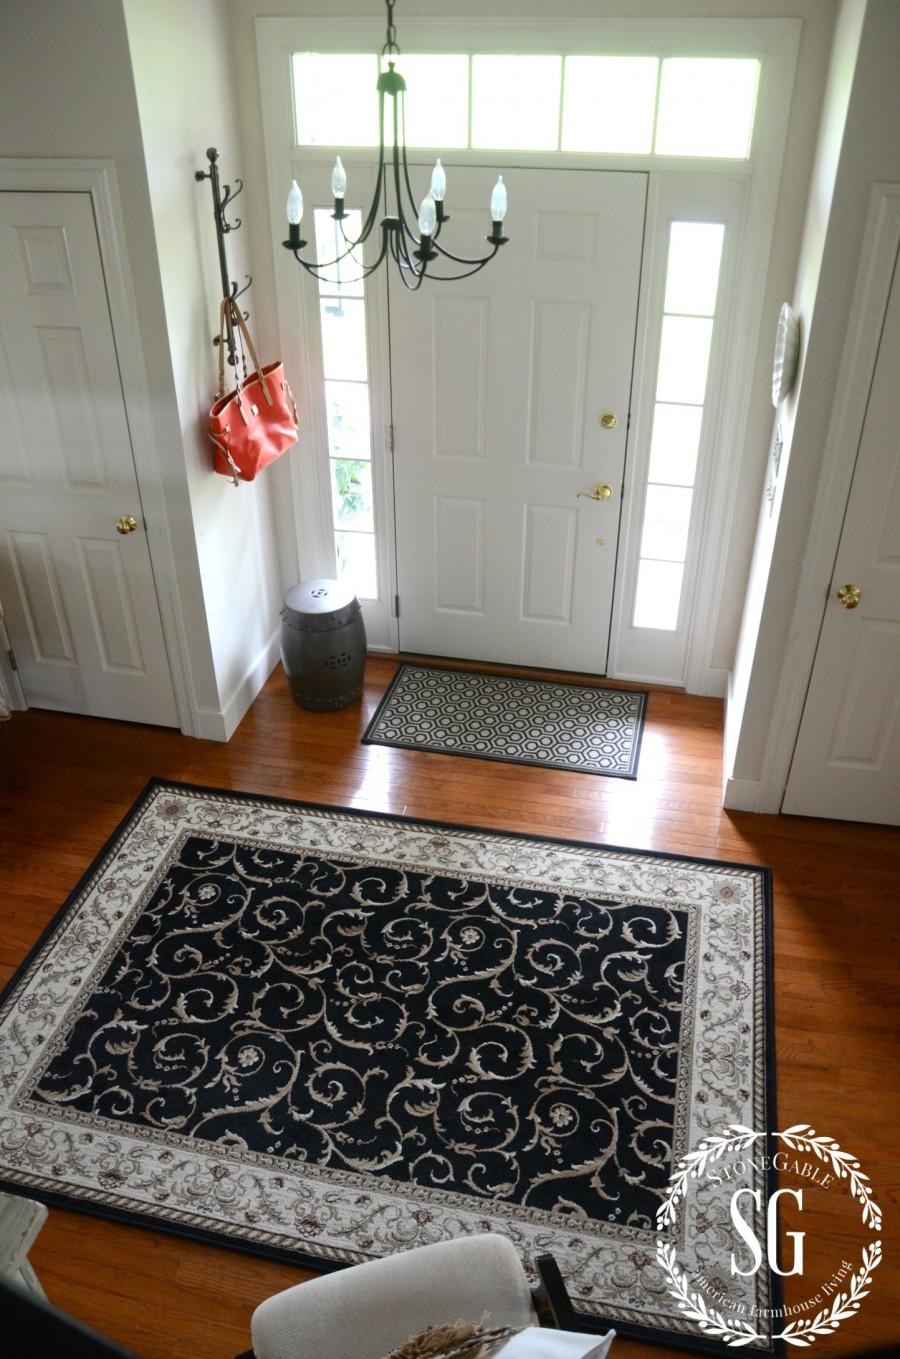 CREATING A WELCOMING FOYER-front door-chandy-stonegableblog.com